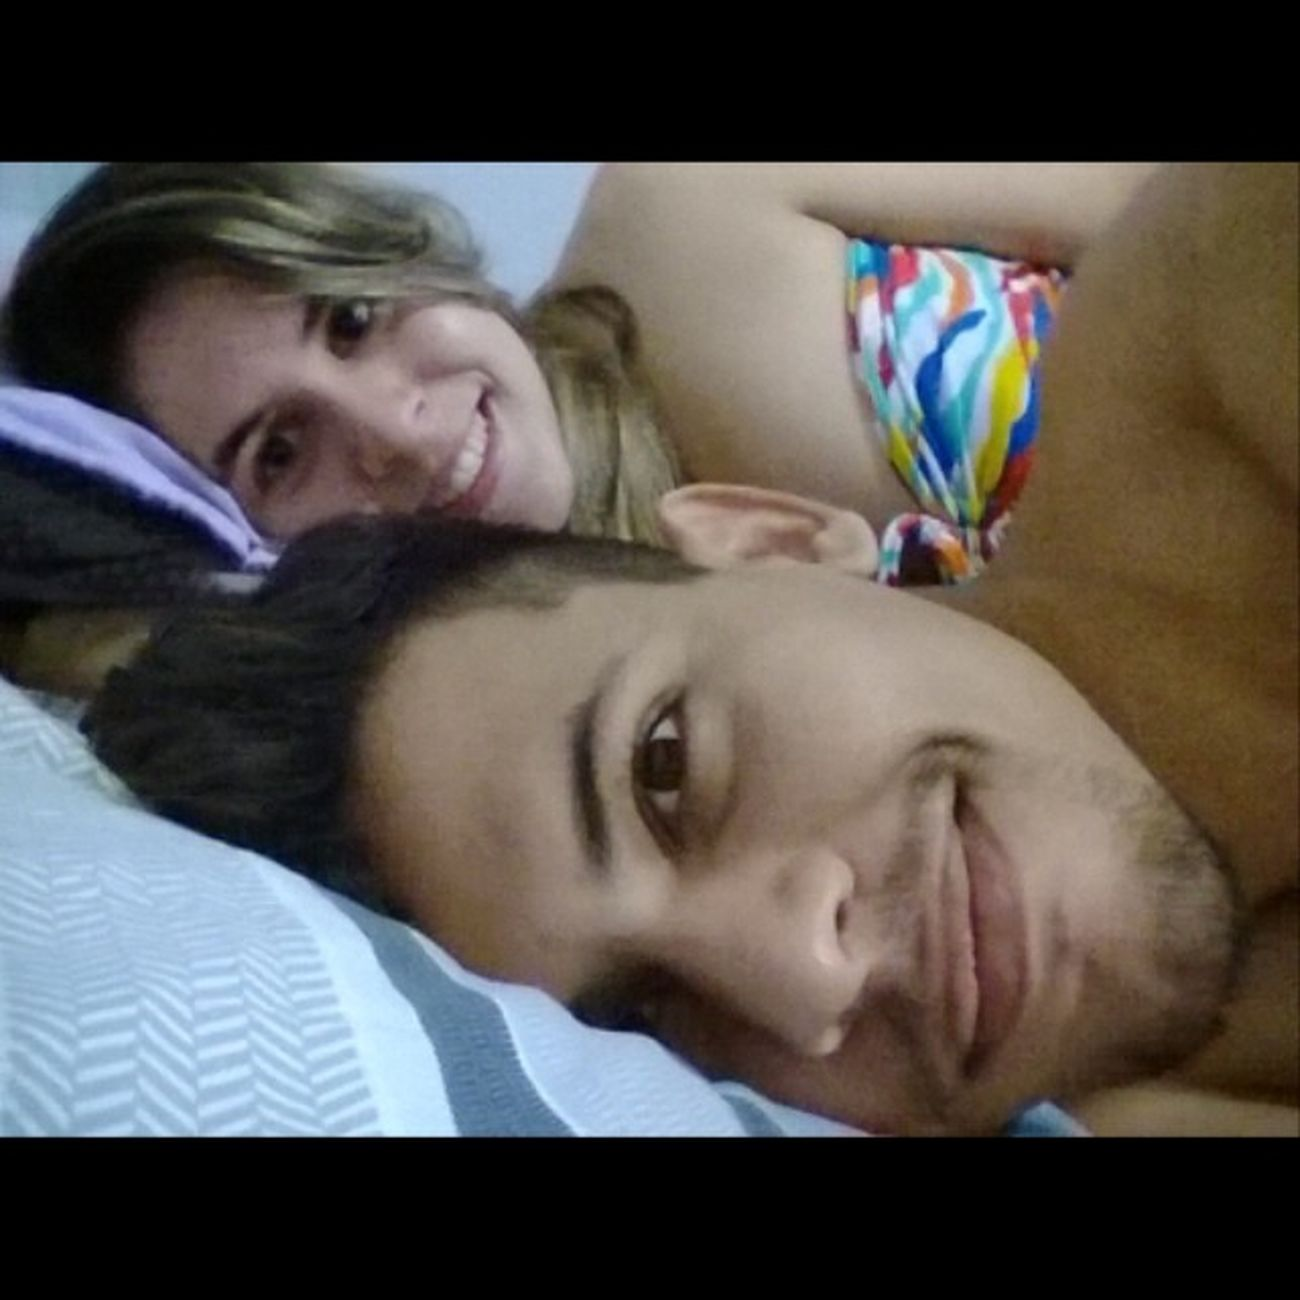 Tardeboa Largadoemcasa Feiosao Caradesono @janfern amor gata